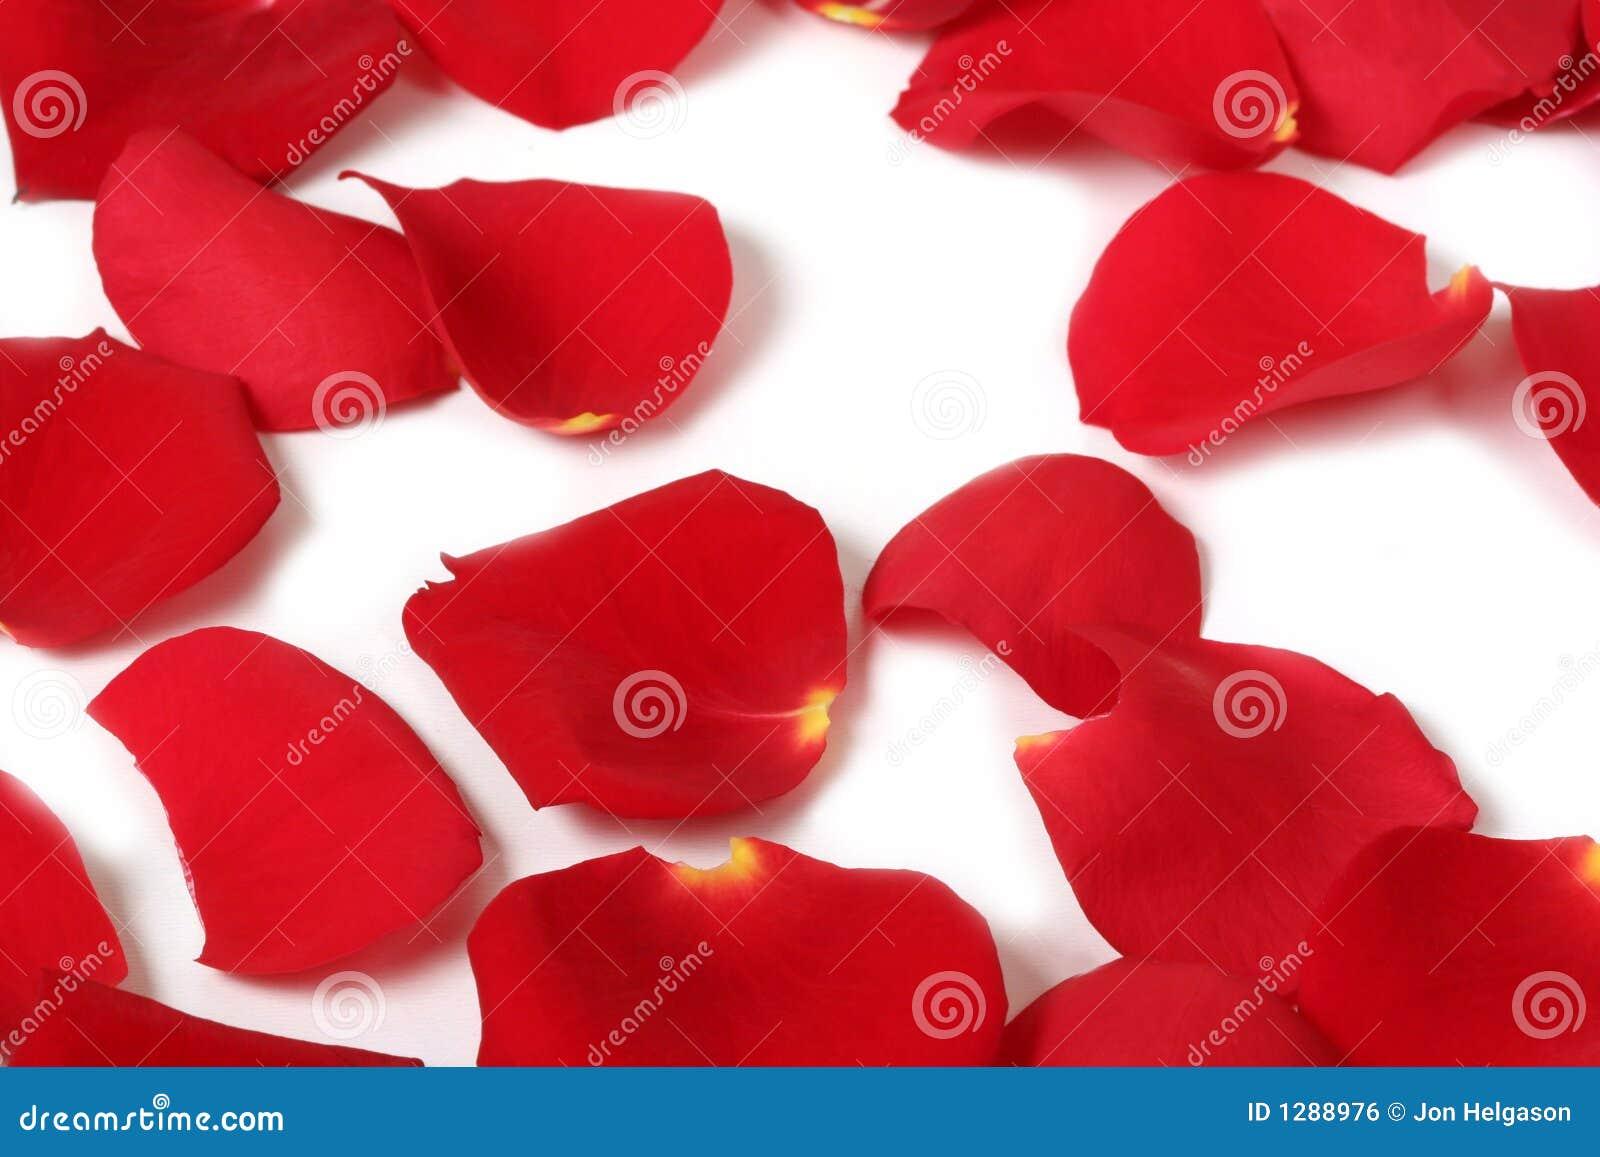 Macro rose petals